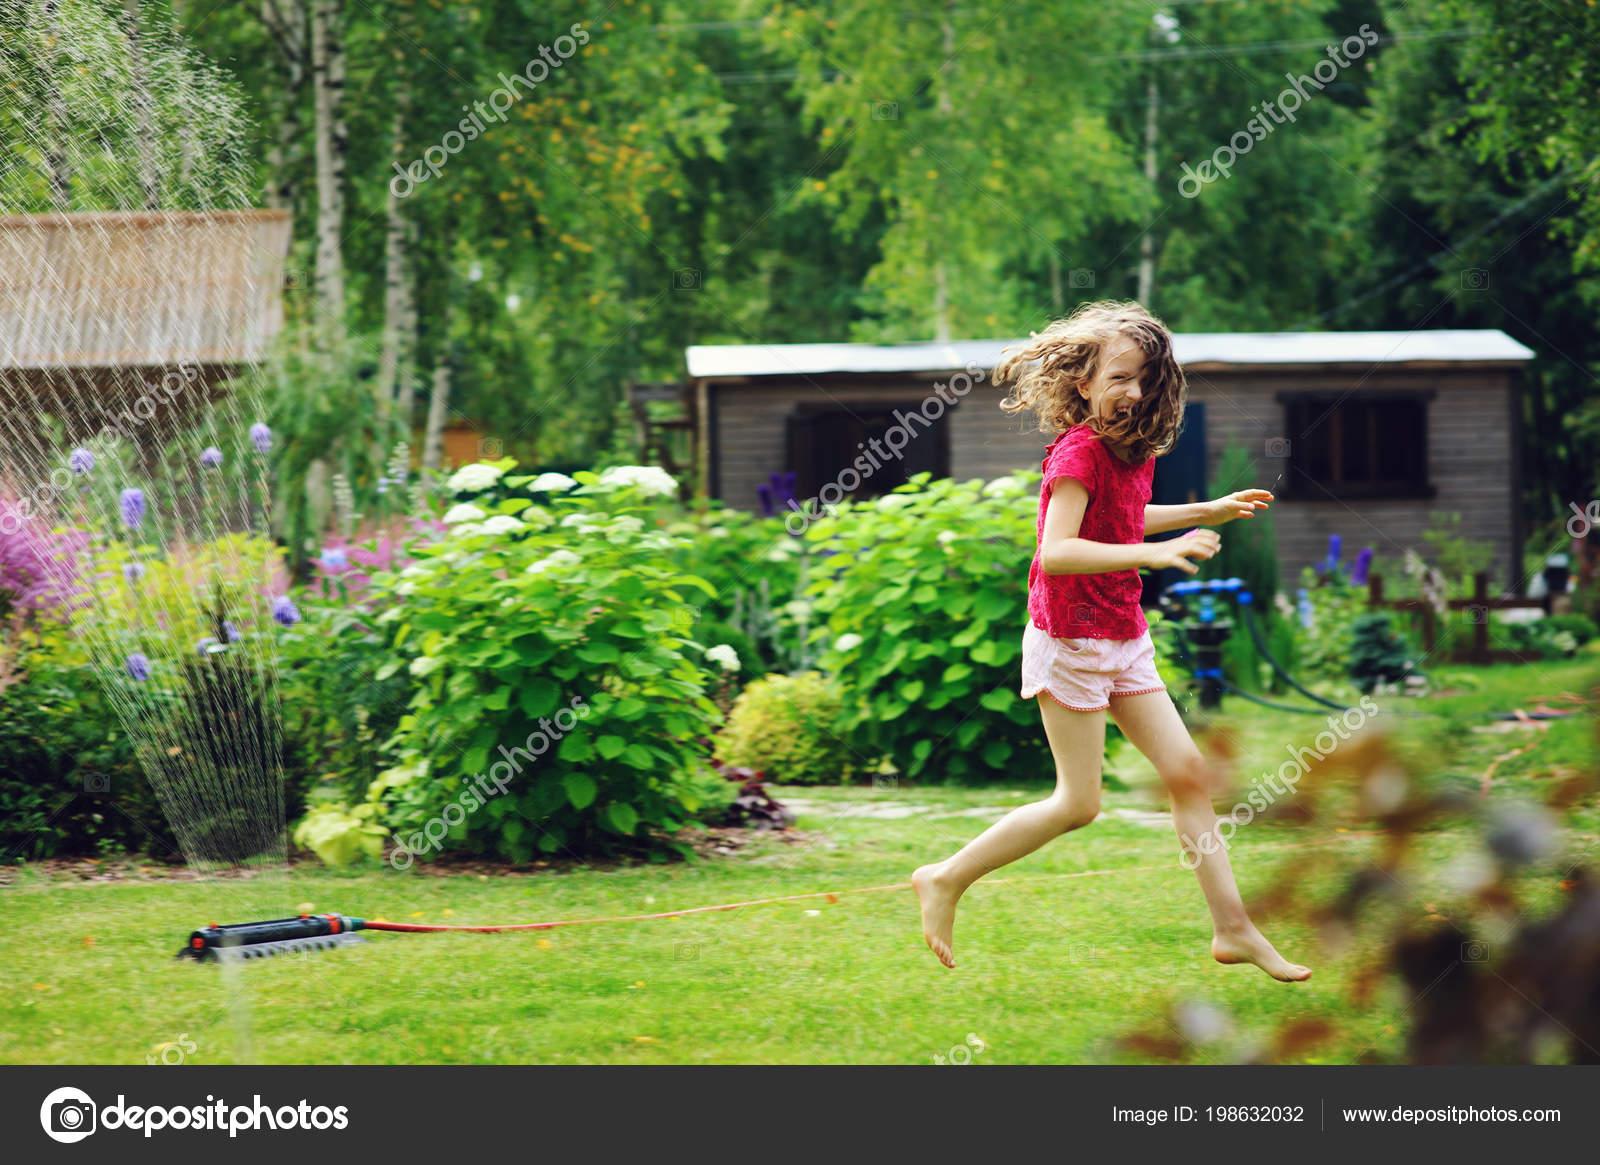 Kid girl playing with garden sprinkler in hot summer day. Water outdoor  activities for children, happy childhood. 19